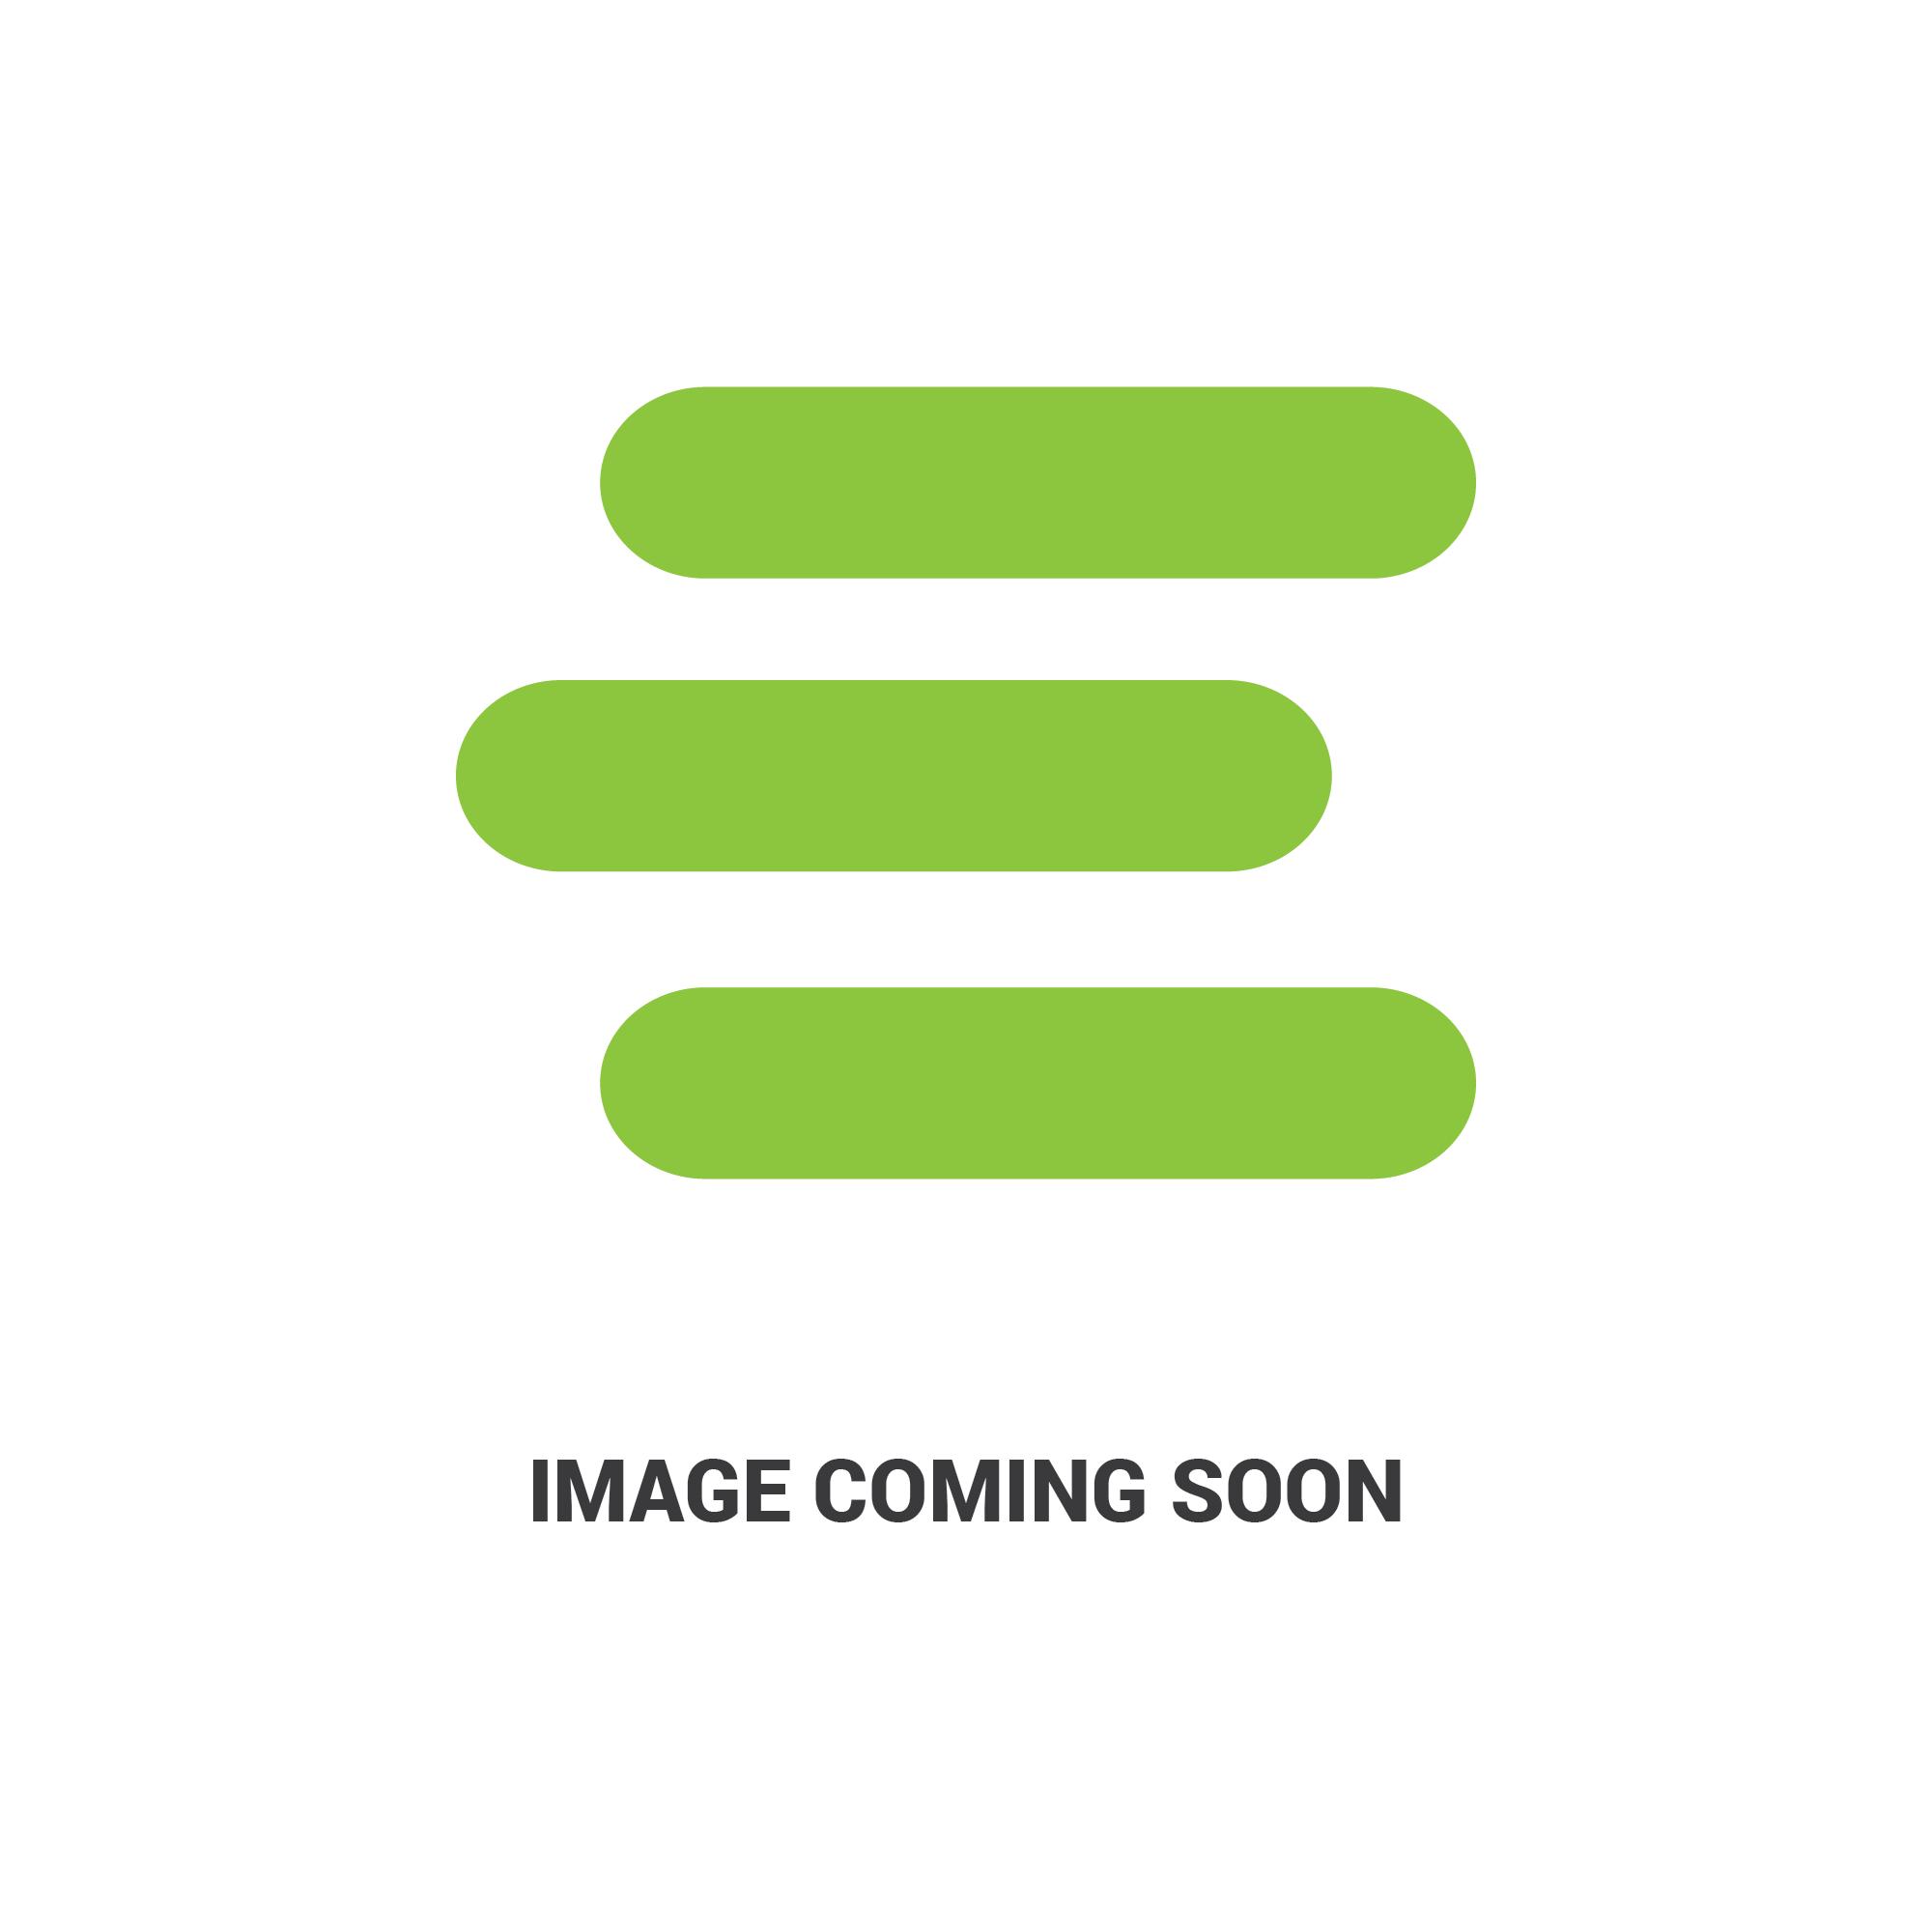 E-75596-42620edit 2.jpg